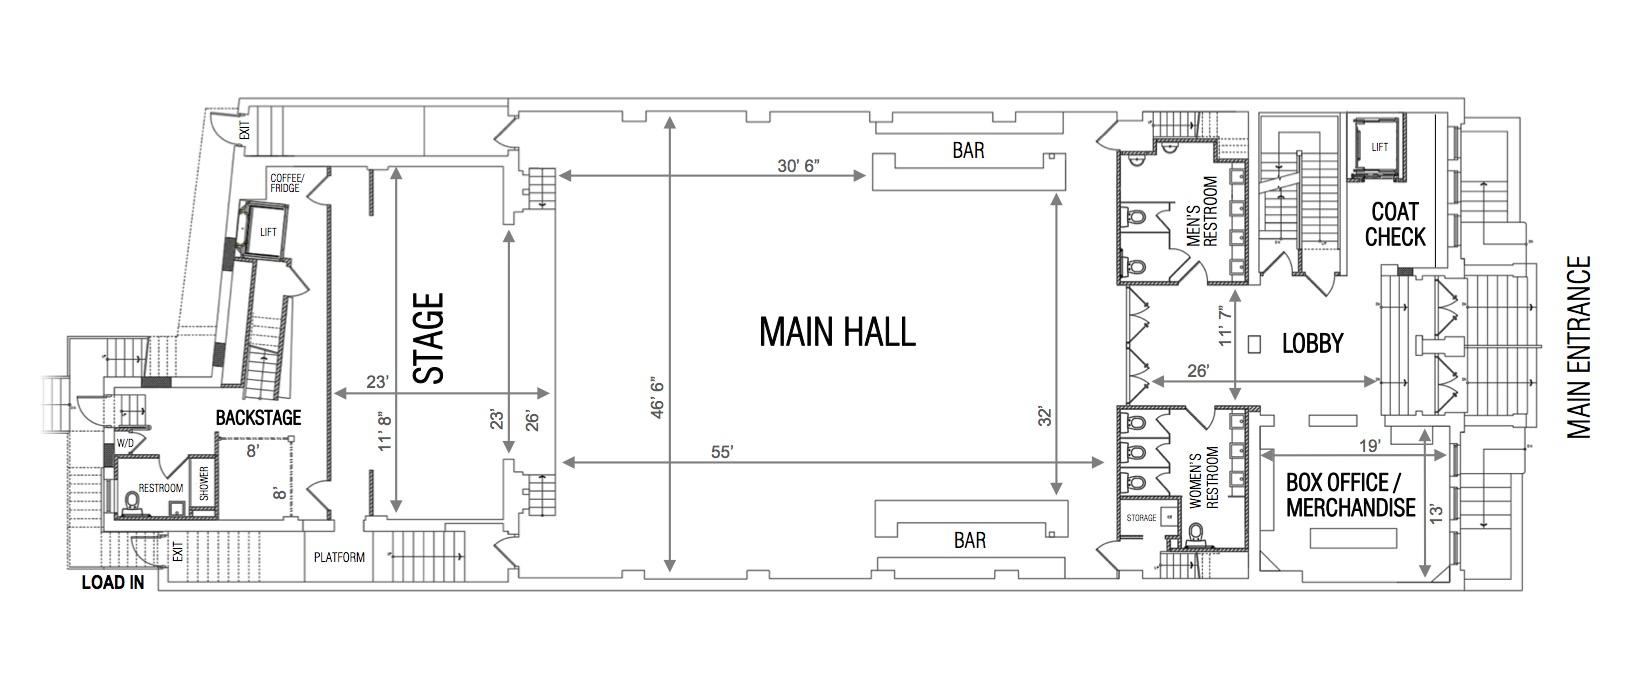 White Eagle Hall Floor Plan - source:http://www.whiteeaglehalljc.com/about/